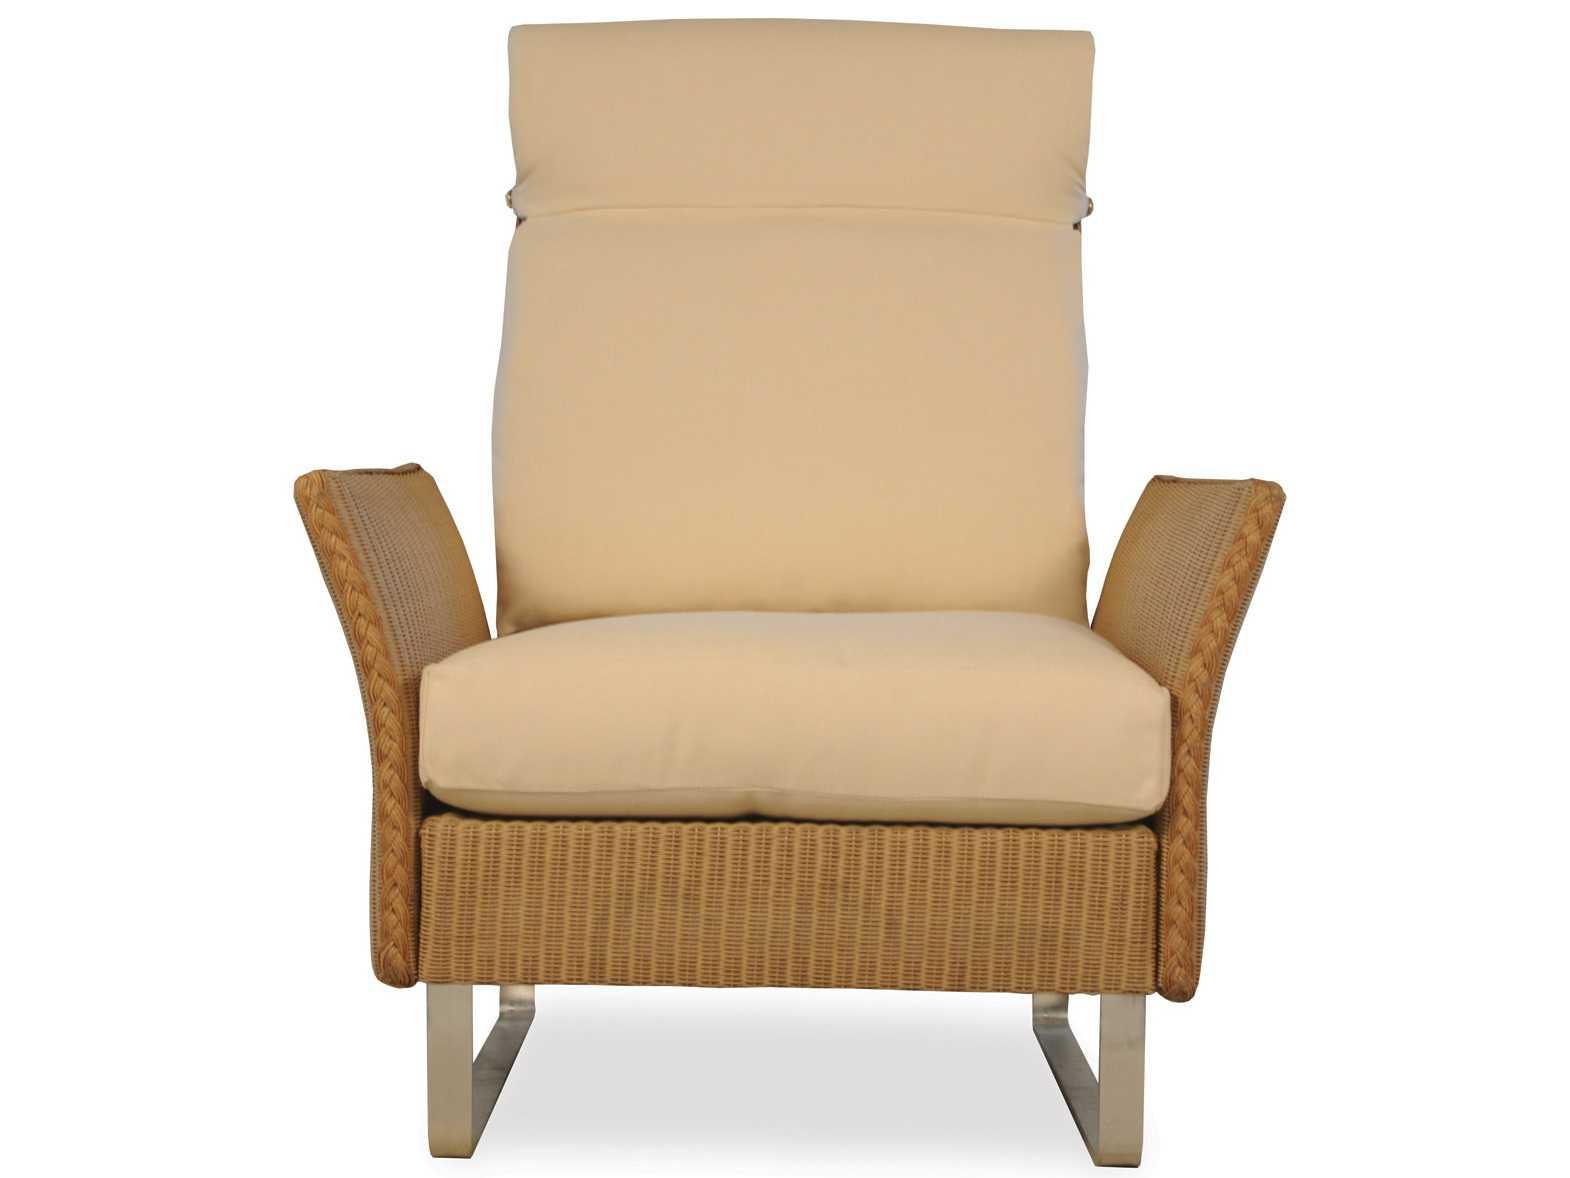 Lloyd Flanders Nova Wicker High Back Lounge Chair